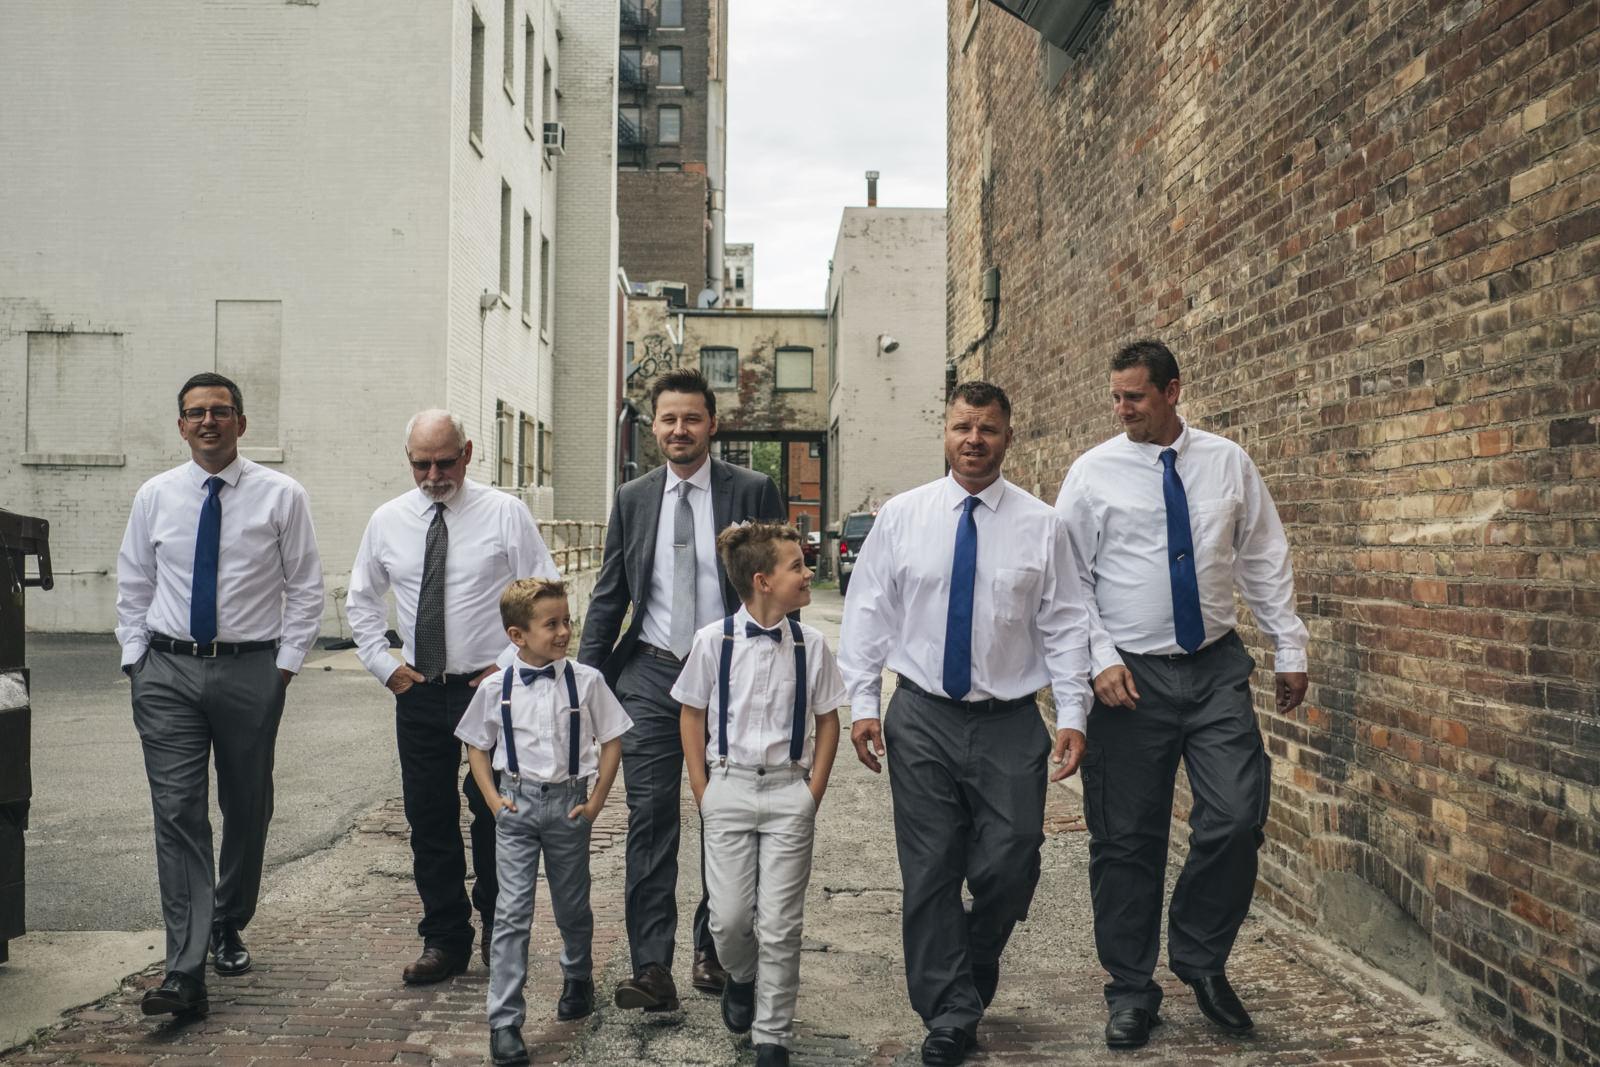 Groom and groomsmen walk down an ally in downtown Toledo.